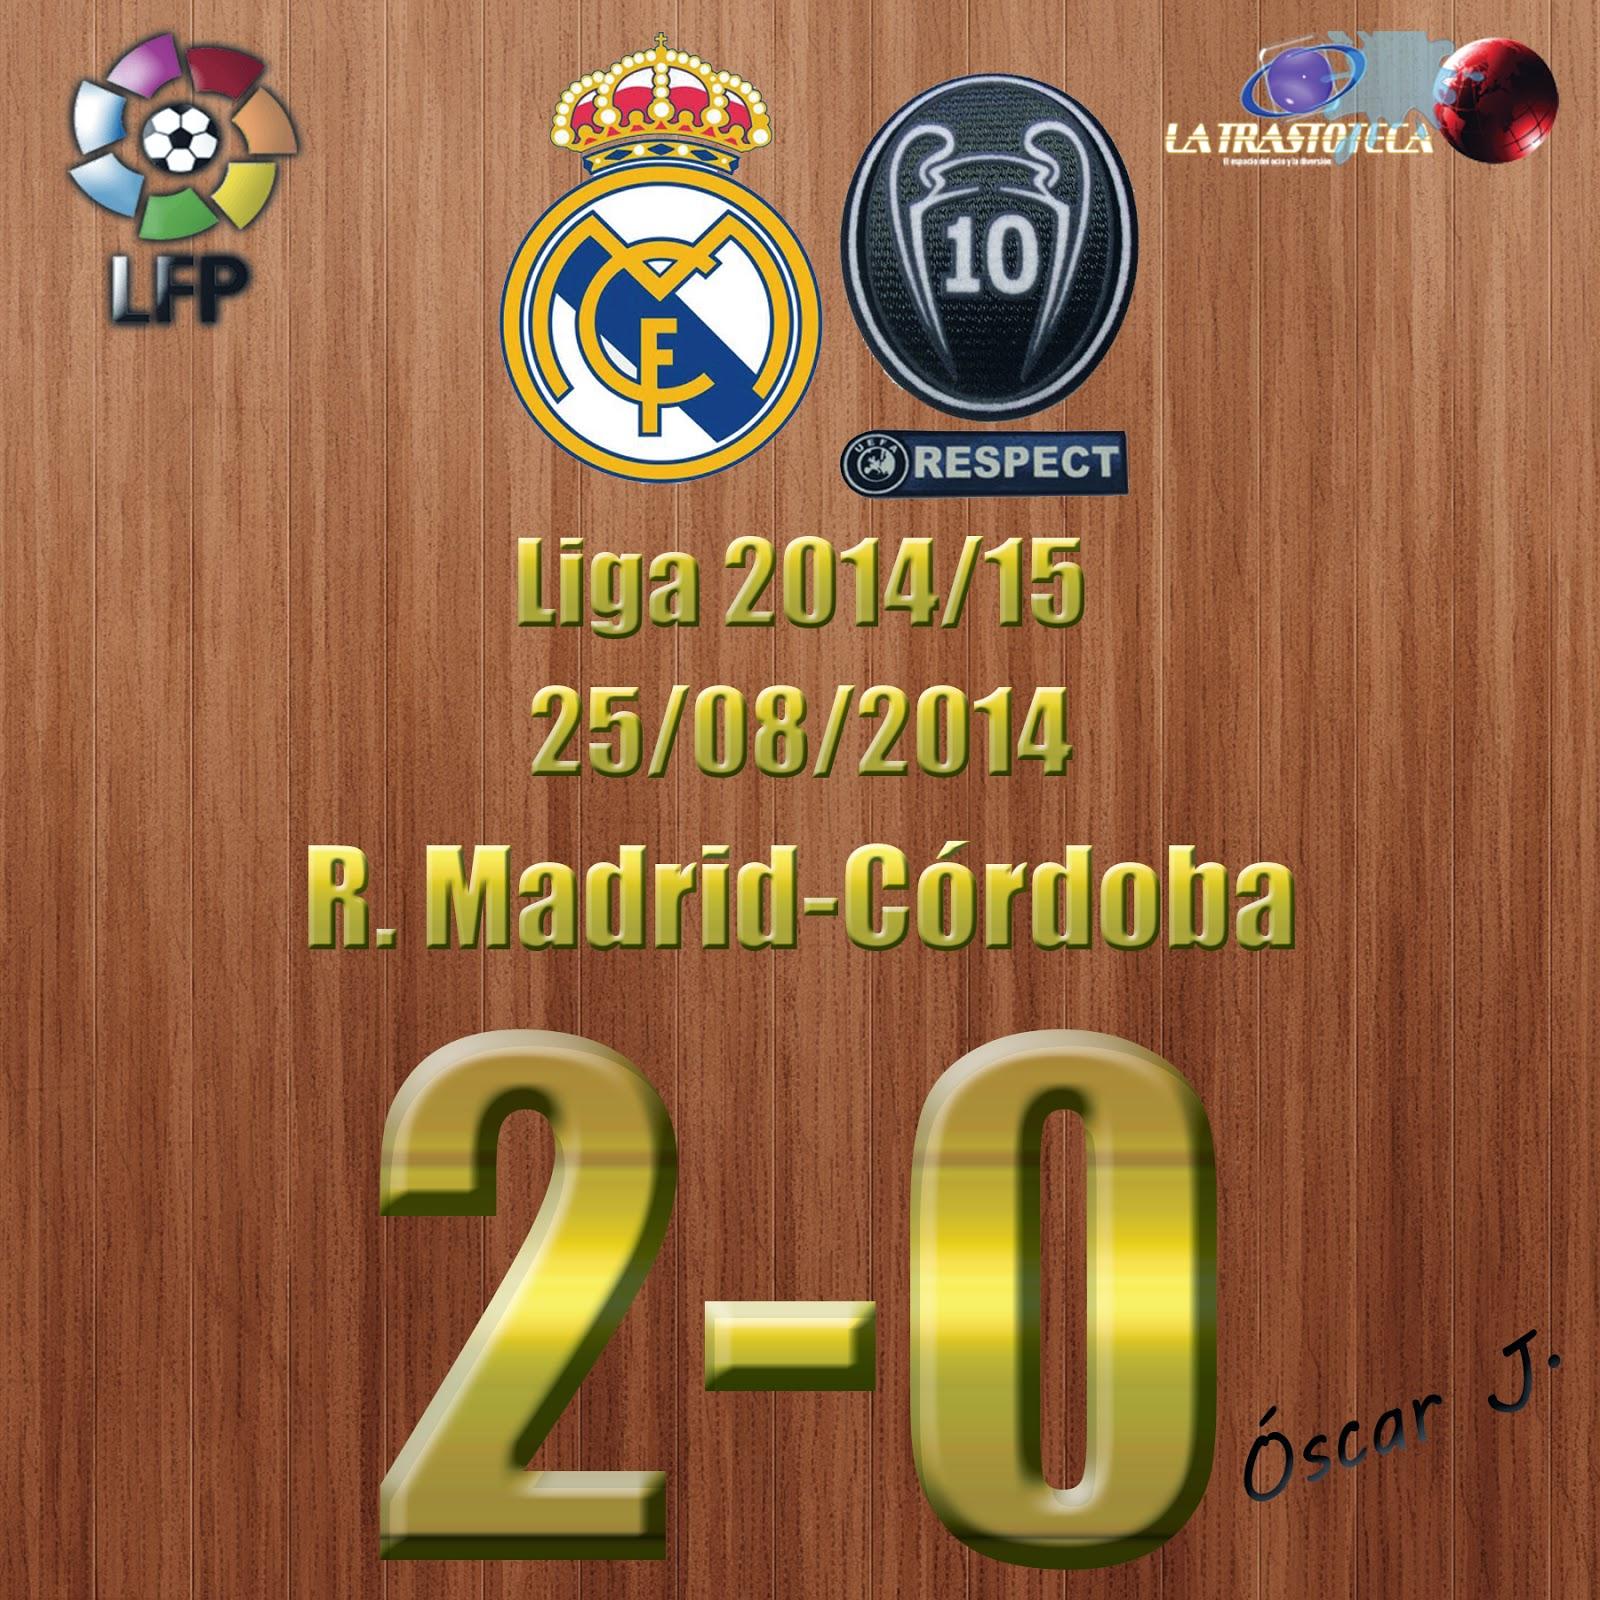 Real Madrid 2 - 0 Córdoba - Jornada 1 - 25/08/2014.